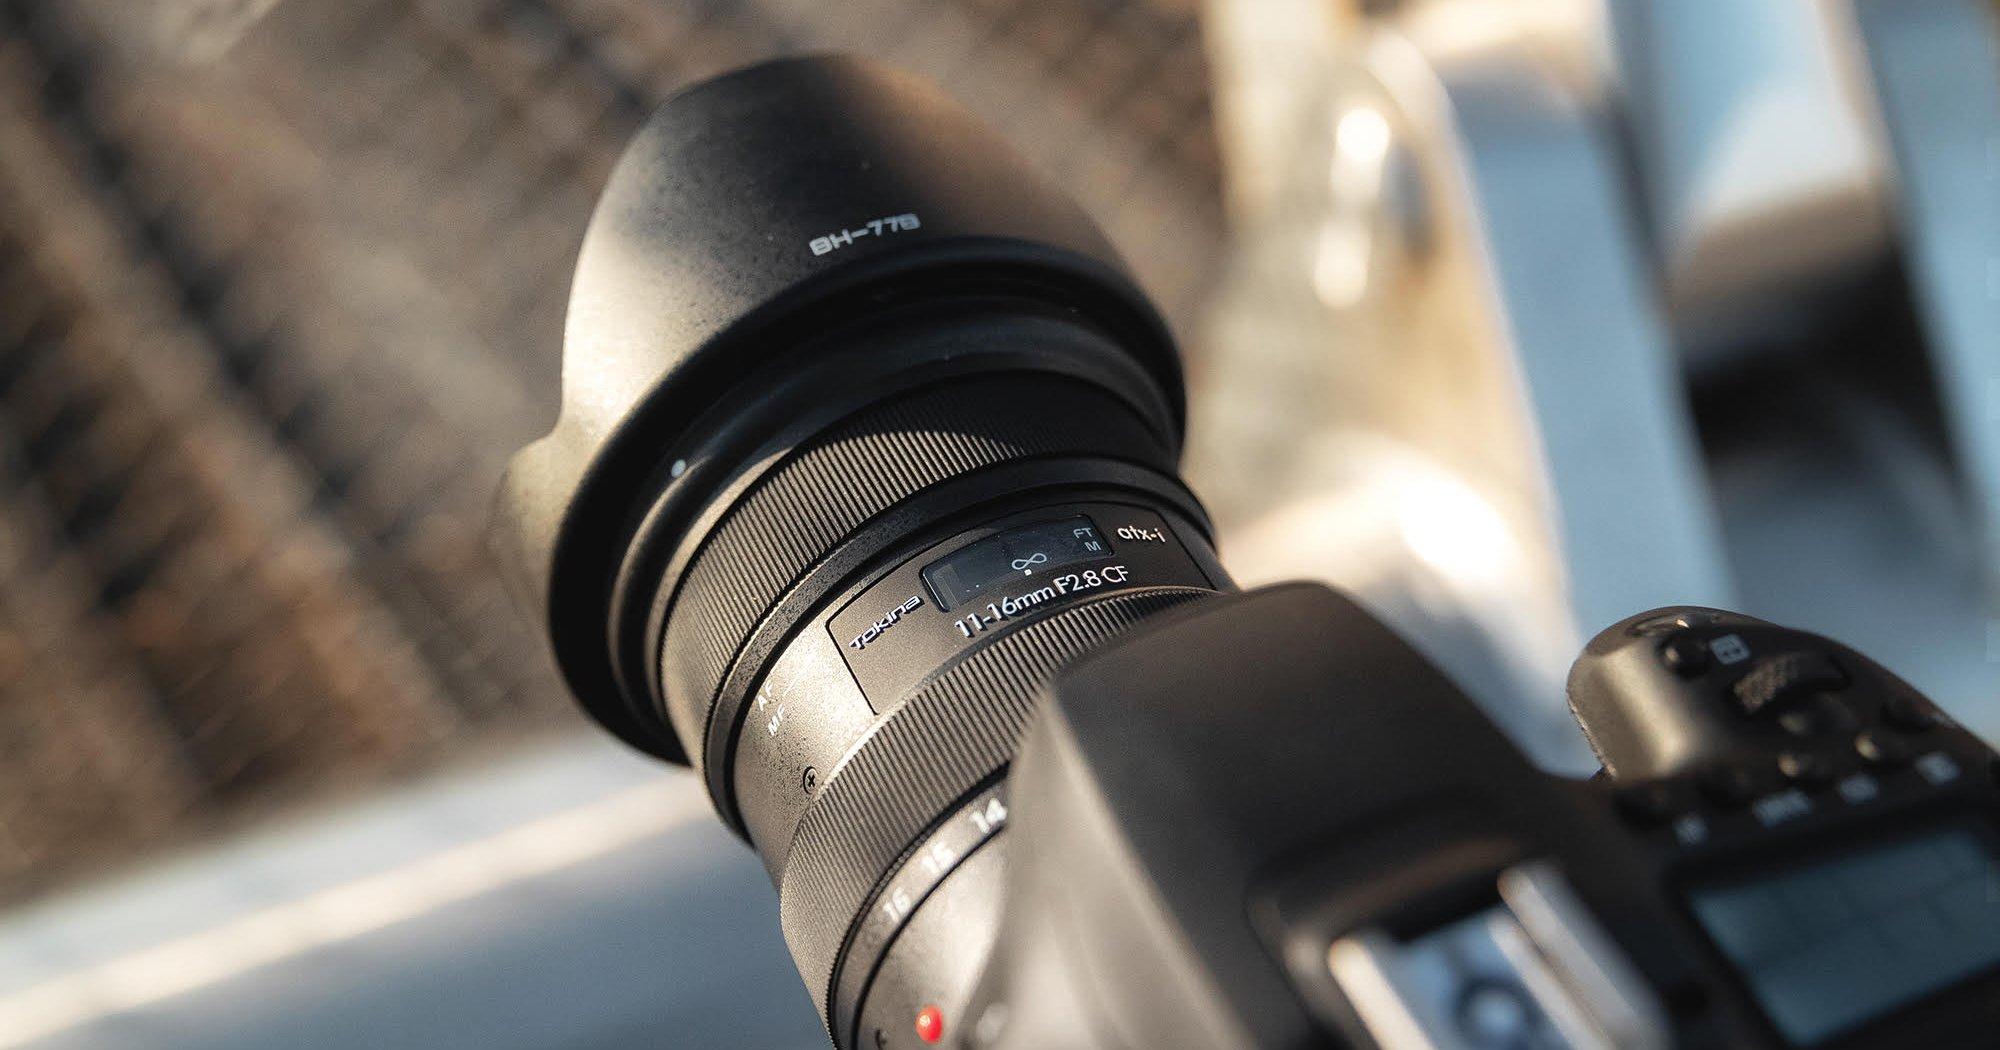 Tokina Unveils Affordable New ATX-i 11-16mm f/2.8 CF Lens for Crop Sensor DSLRs